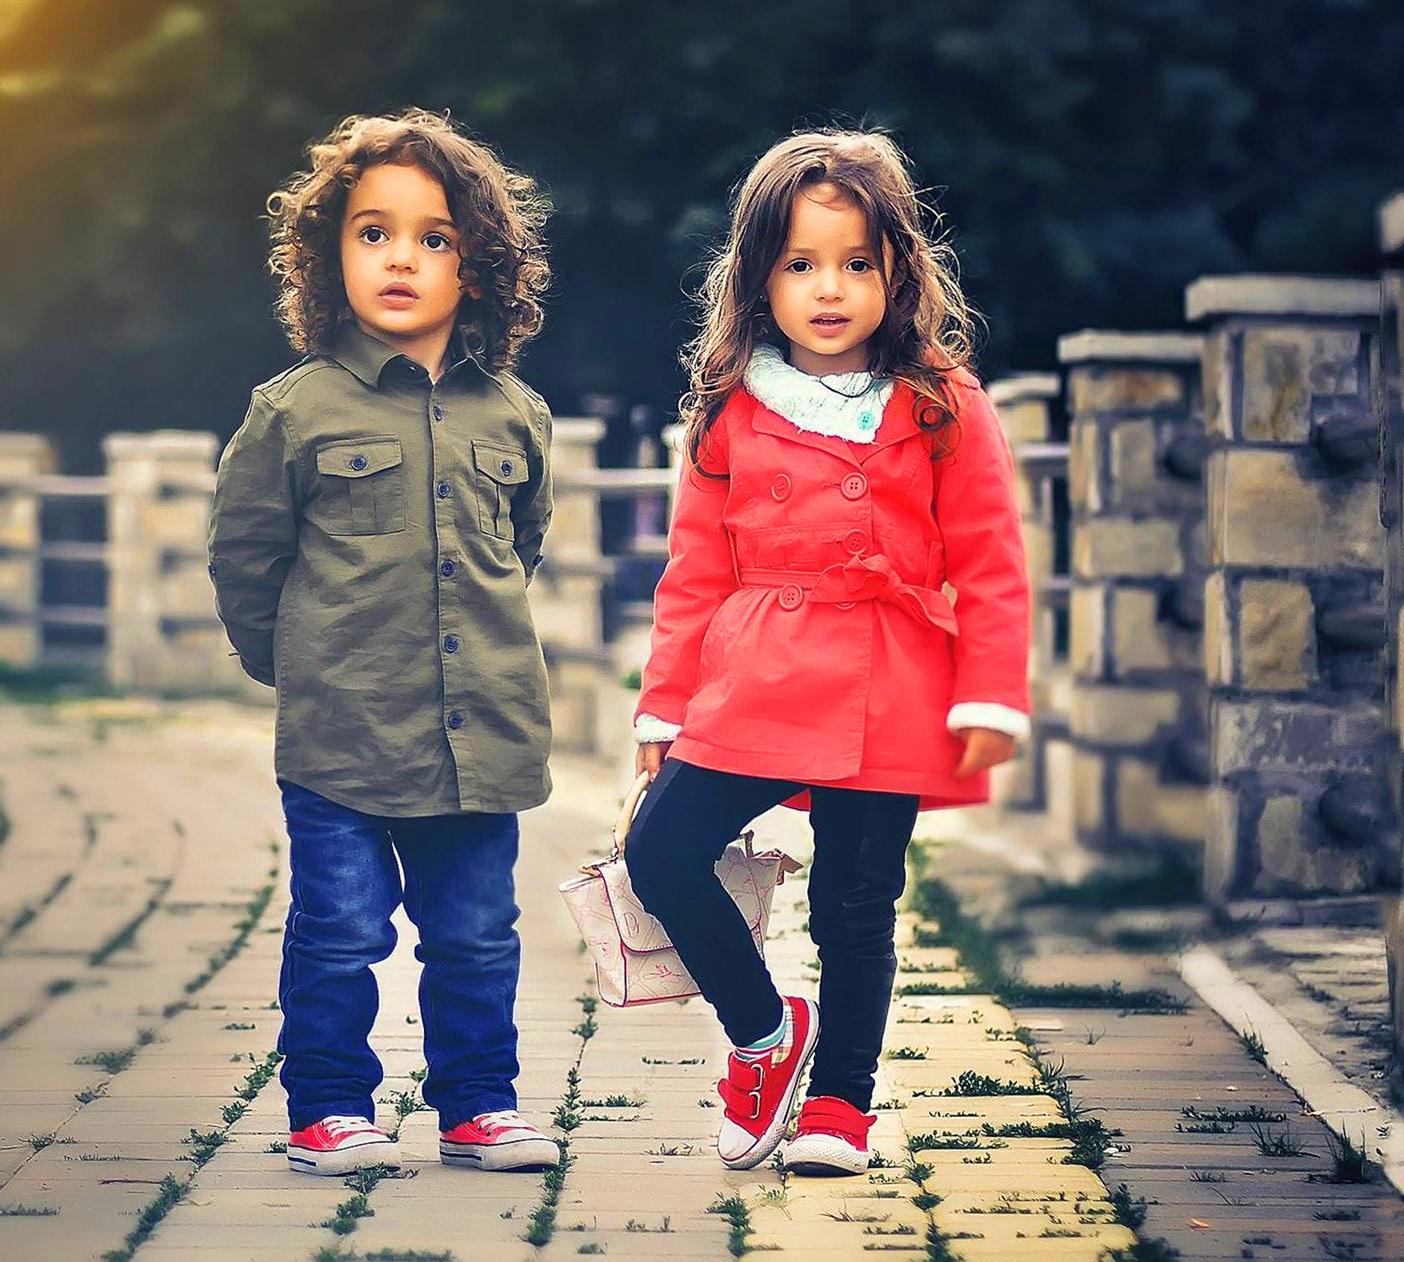 Cute Boys Girls Whatsapp DP Images 3 1